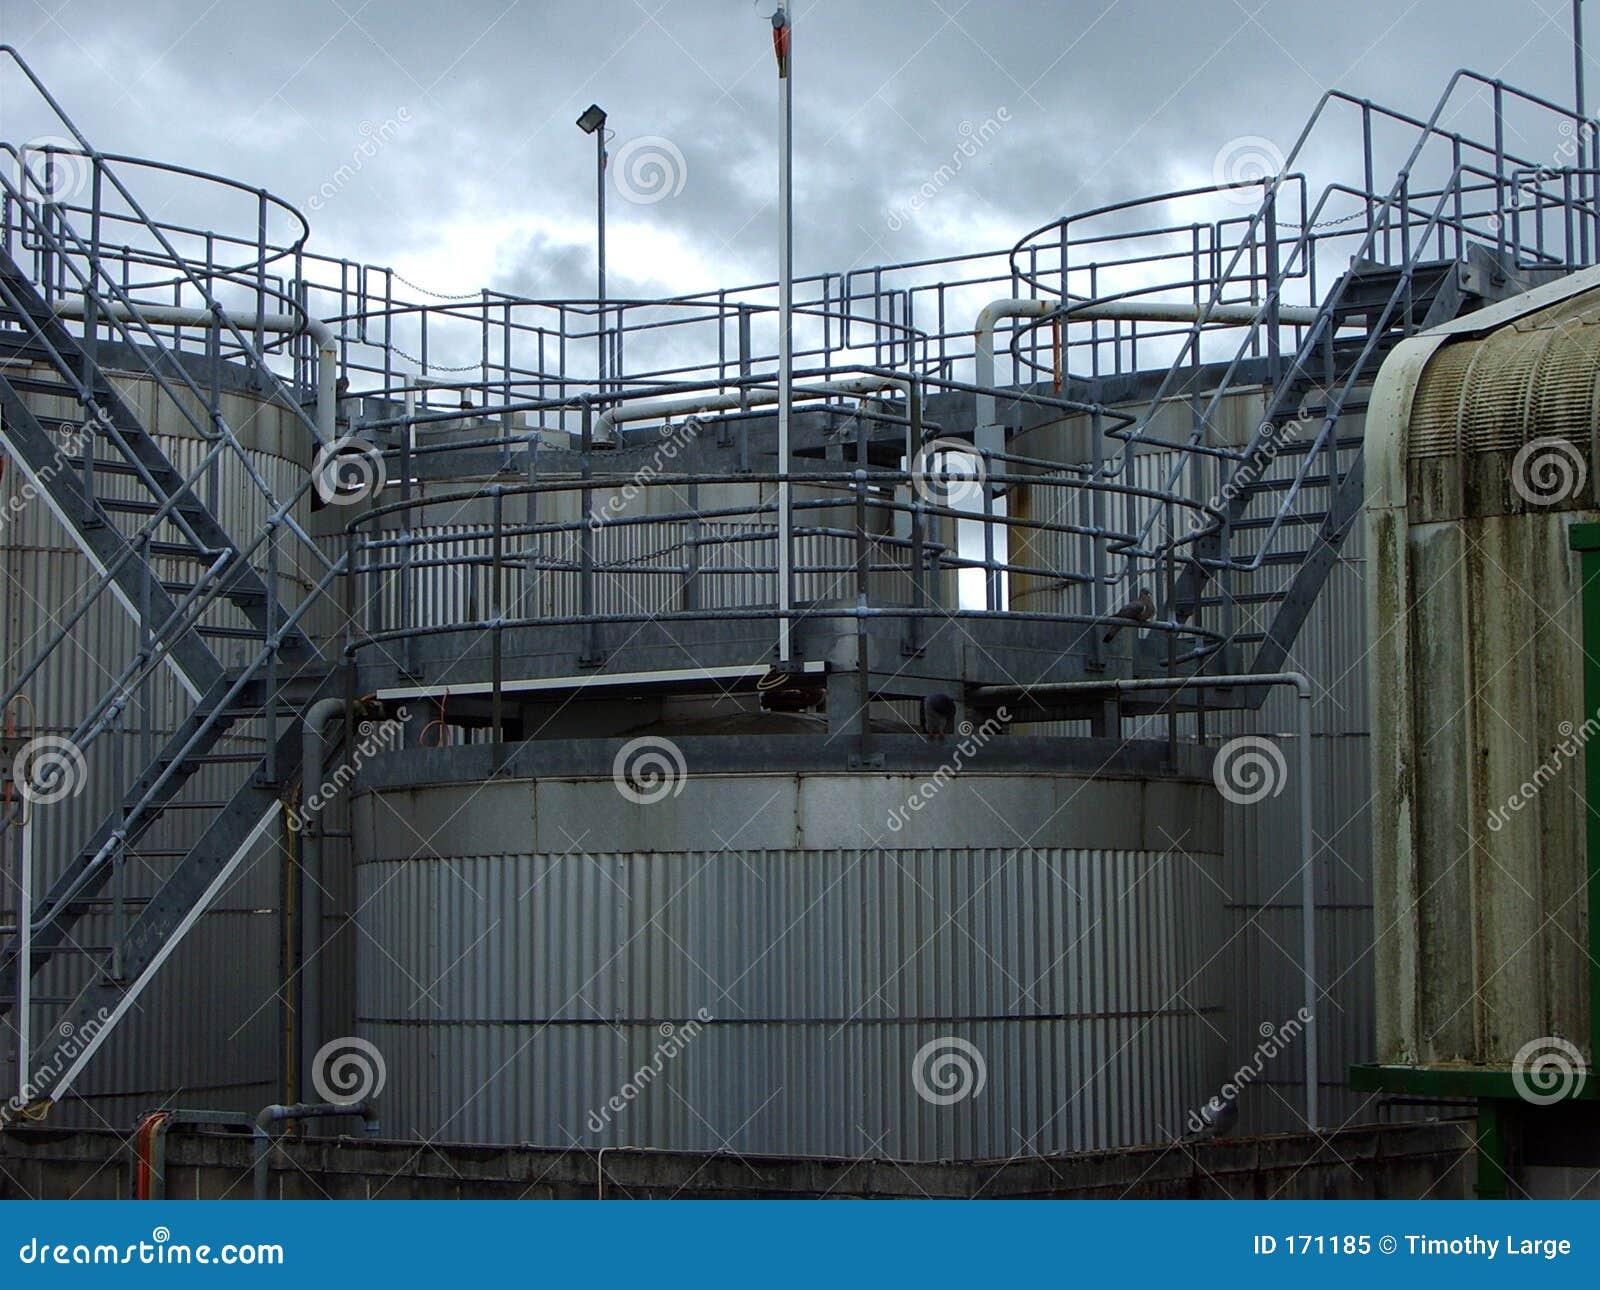 Tanks and rails